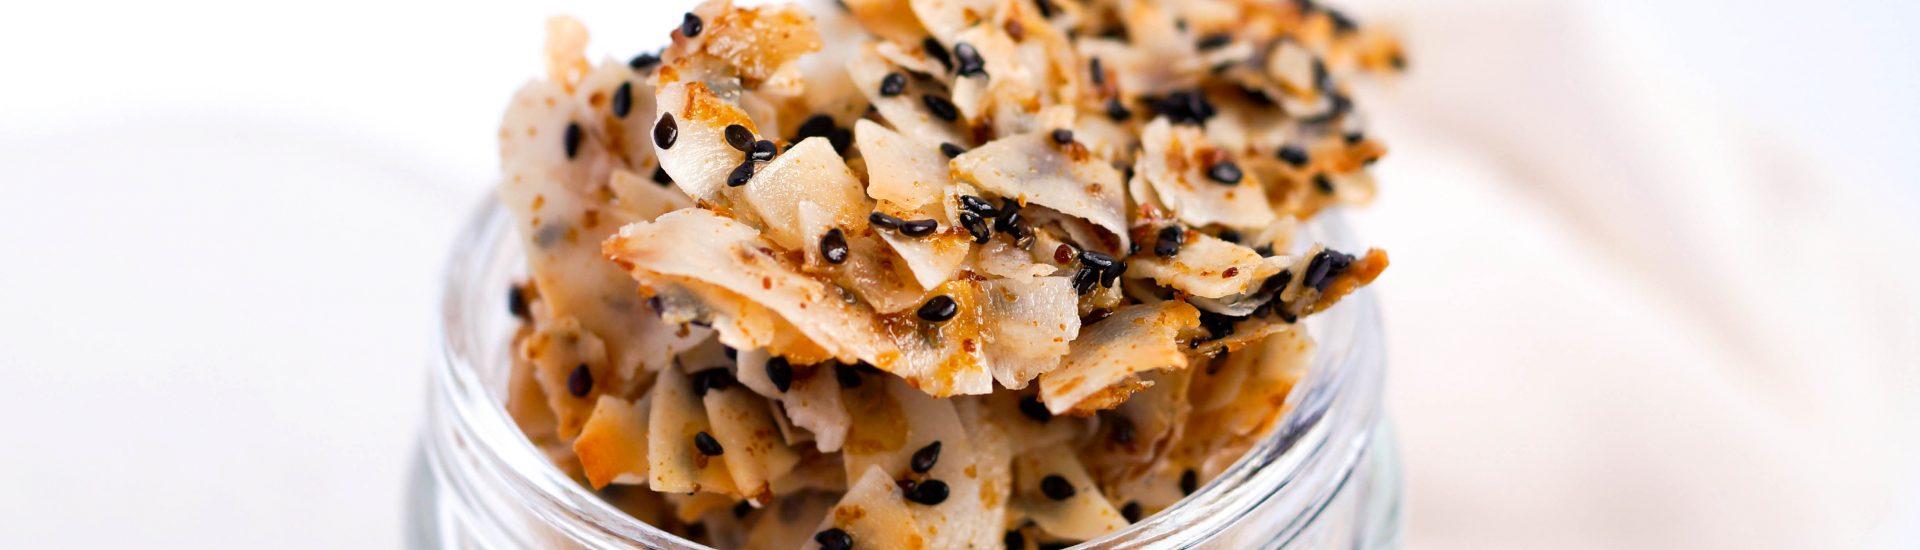 Toasted Sesame Coconut Clusters (Vegan & Gluten-free, Paleo)